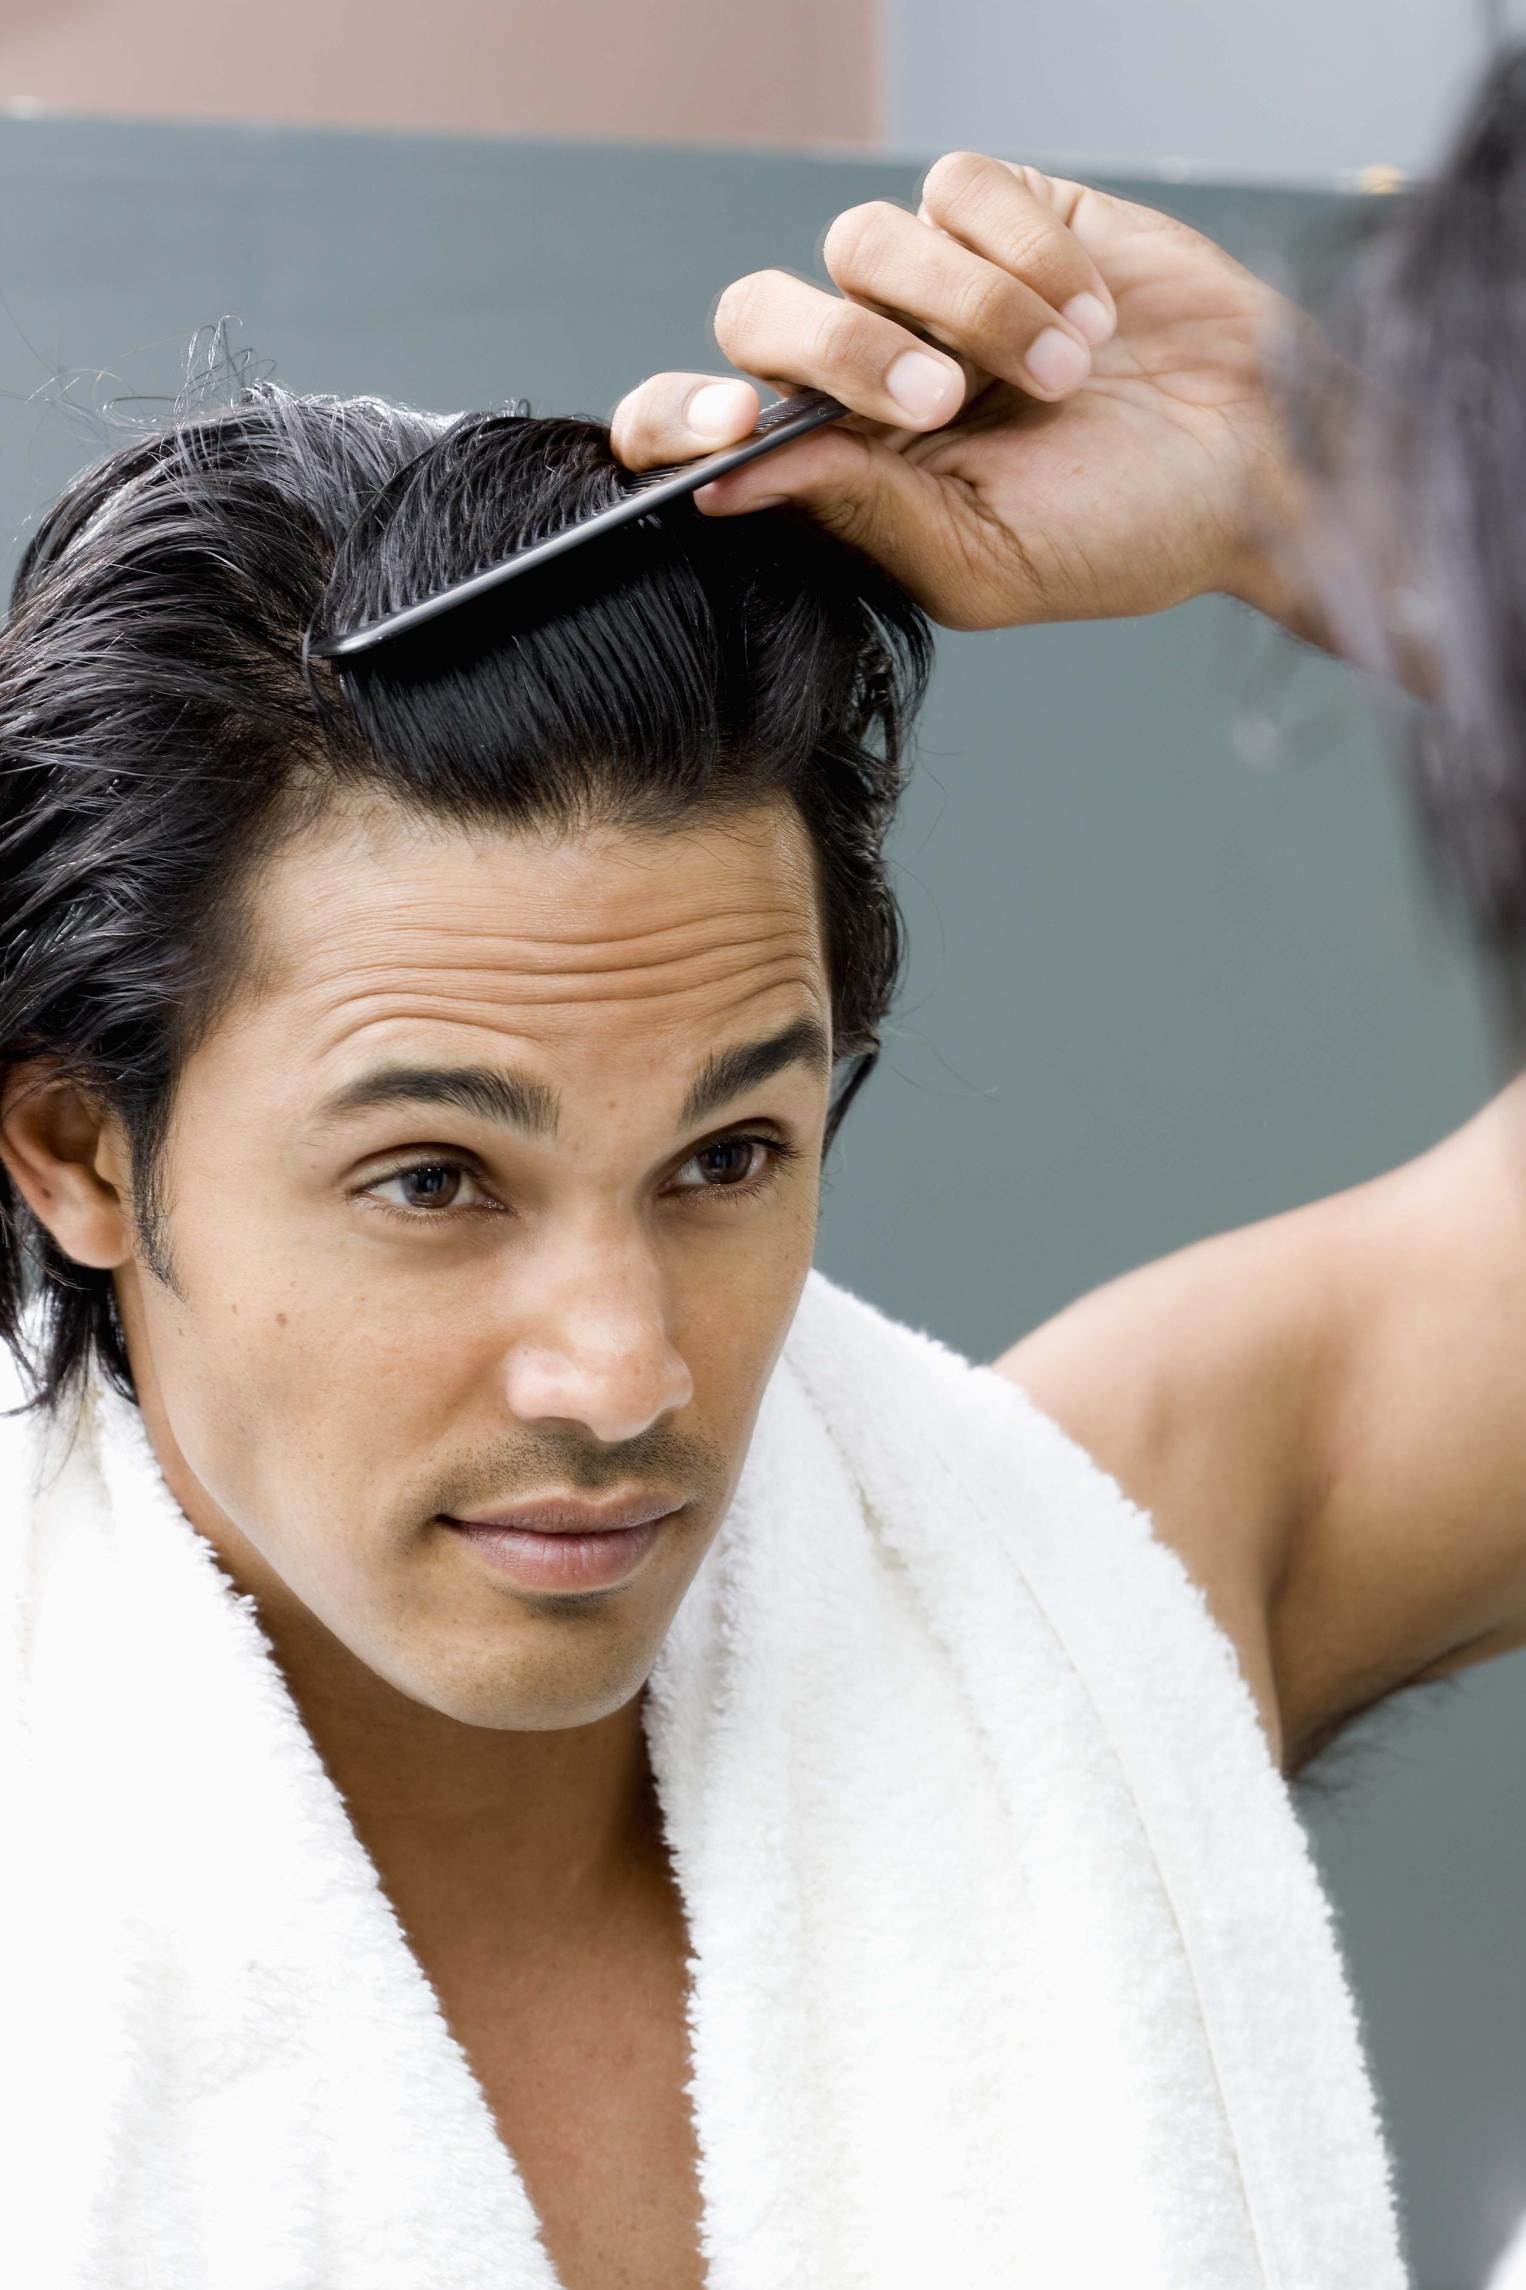 Cortar pelo hombre cortes de pelo hombre spiky zayn malik corte spiky hombre estilosos - Cortar el pelo en casa hombre ...